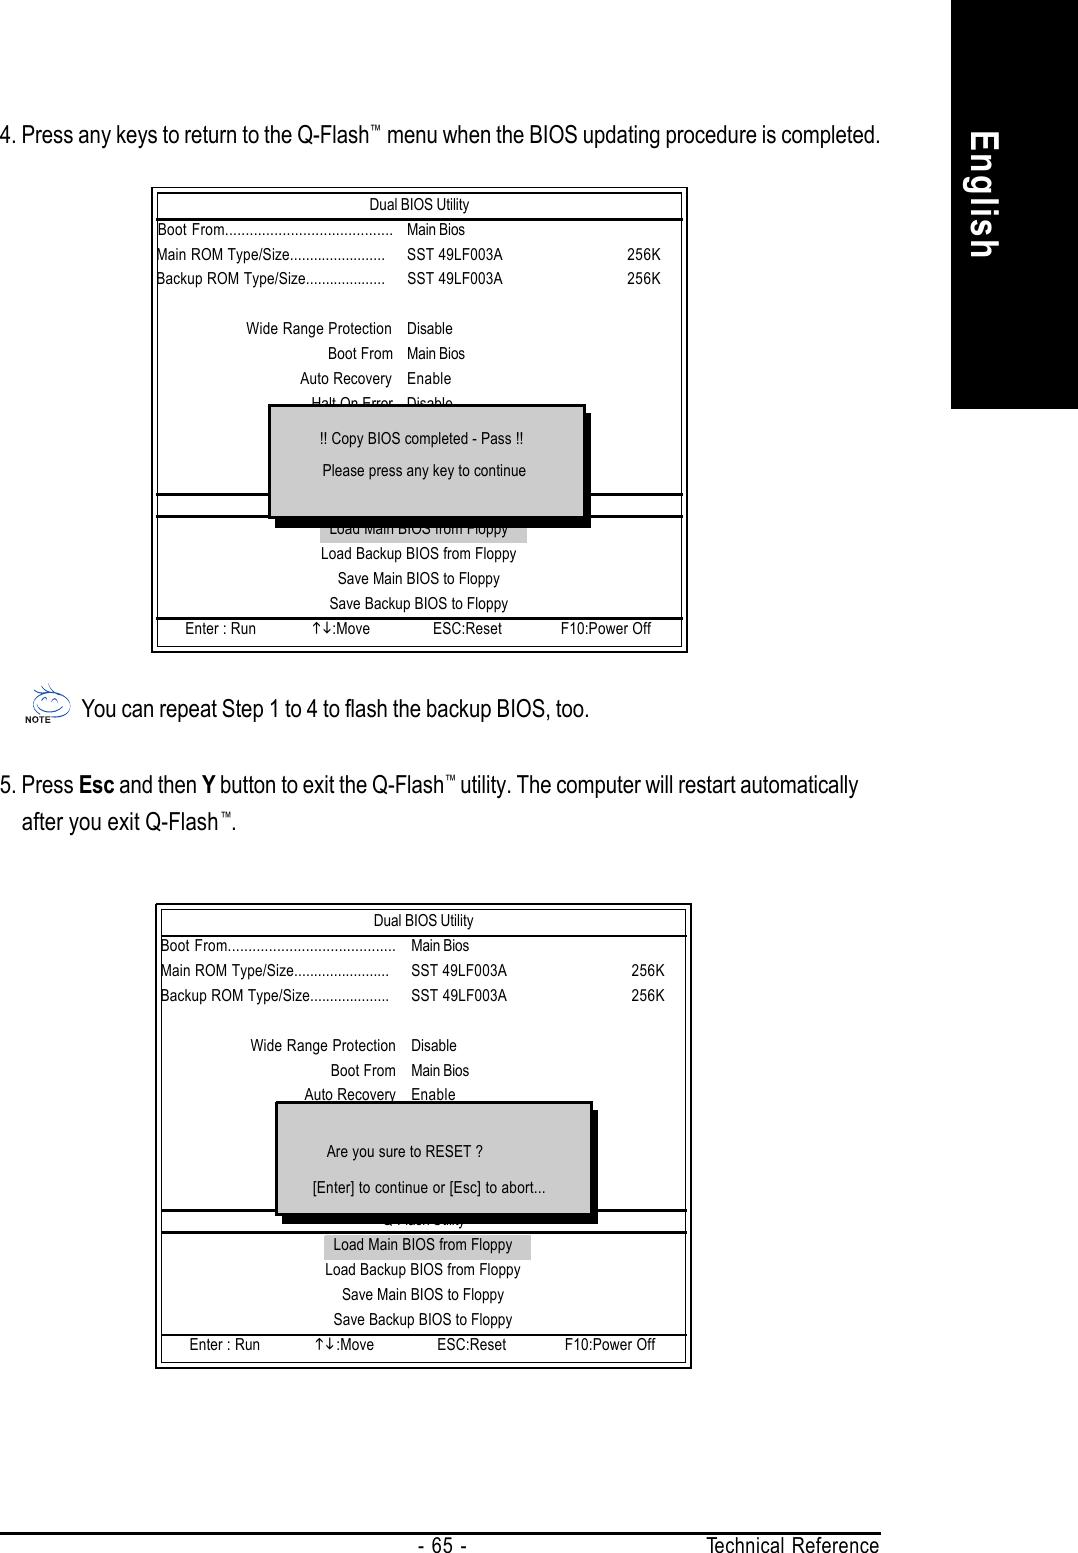 Gigabyte Bios Update Procedure